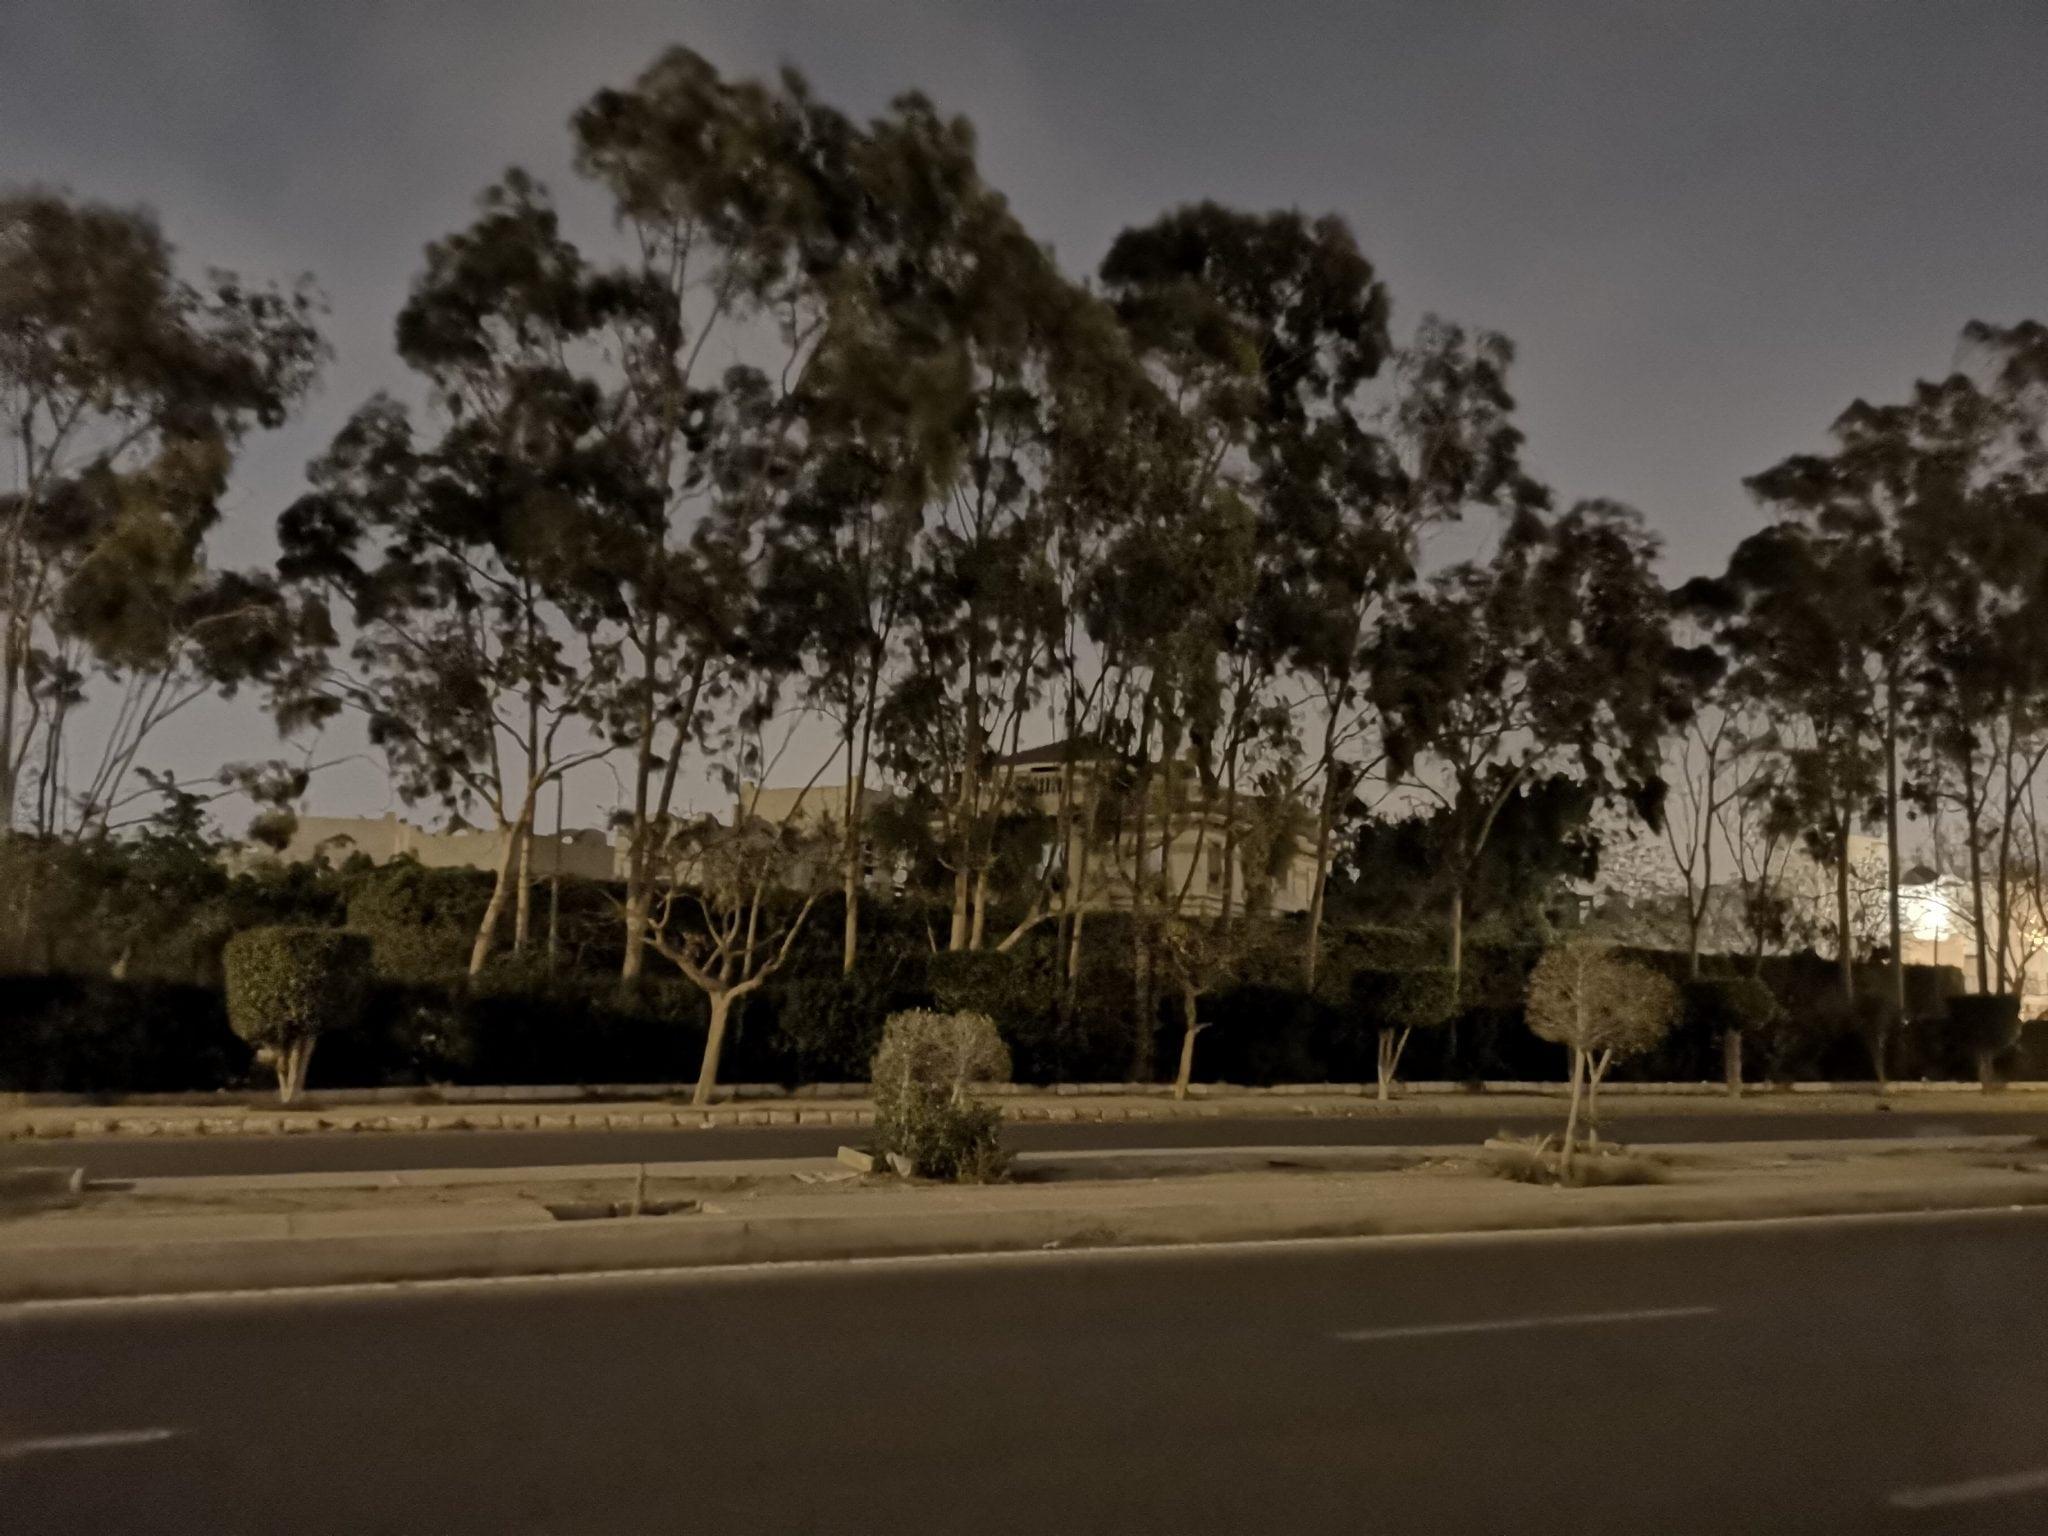 P20 Pro Camera Samples- Low Light (1)